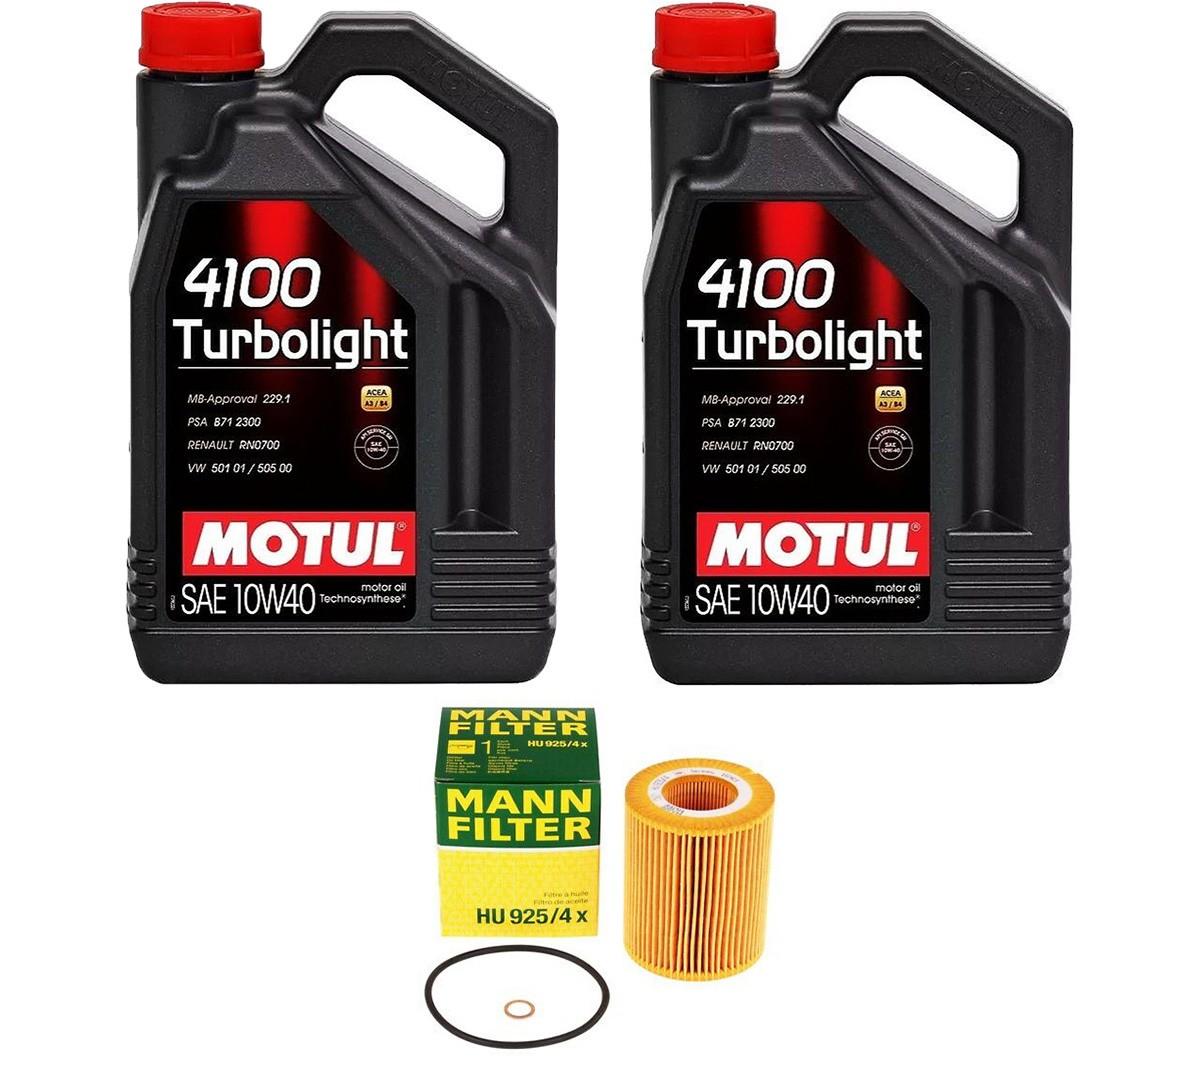 Kit troca de óleo BMW 323 328 330 325 320 1996 a 2005; 528 530 1996 a 2006; X5 3.0 2000 a 2003; X3 2003 a 2006; Z3  Z4 2.2 2.8 3.0 1996 a 2005; Motor M52 M54